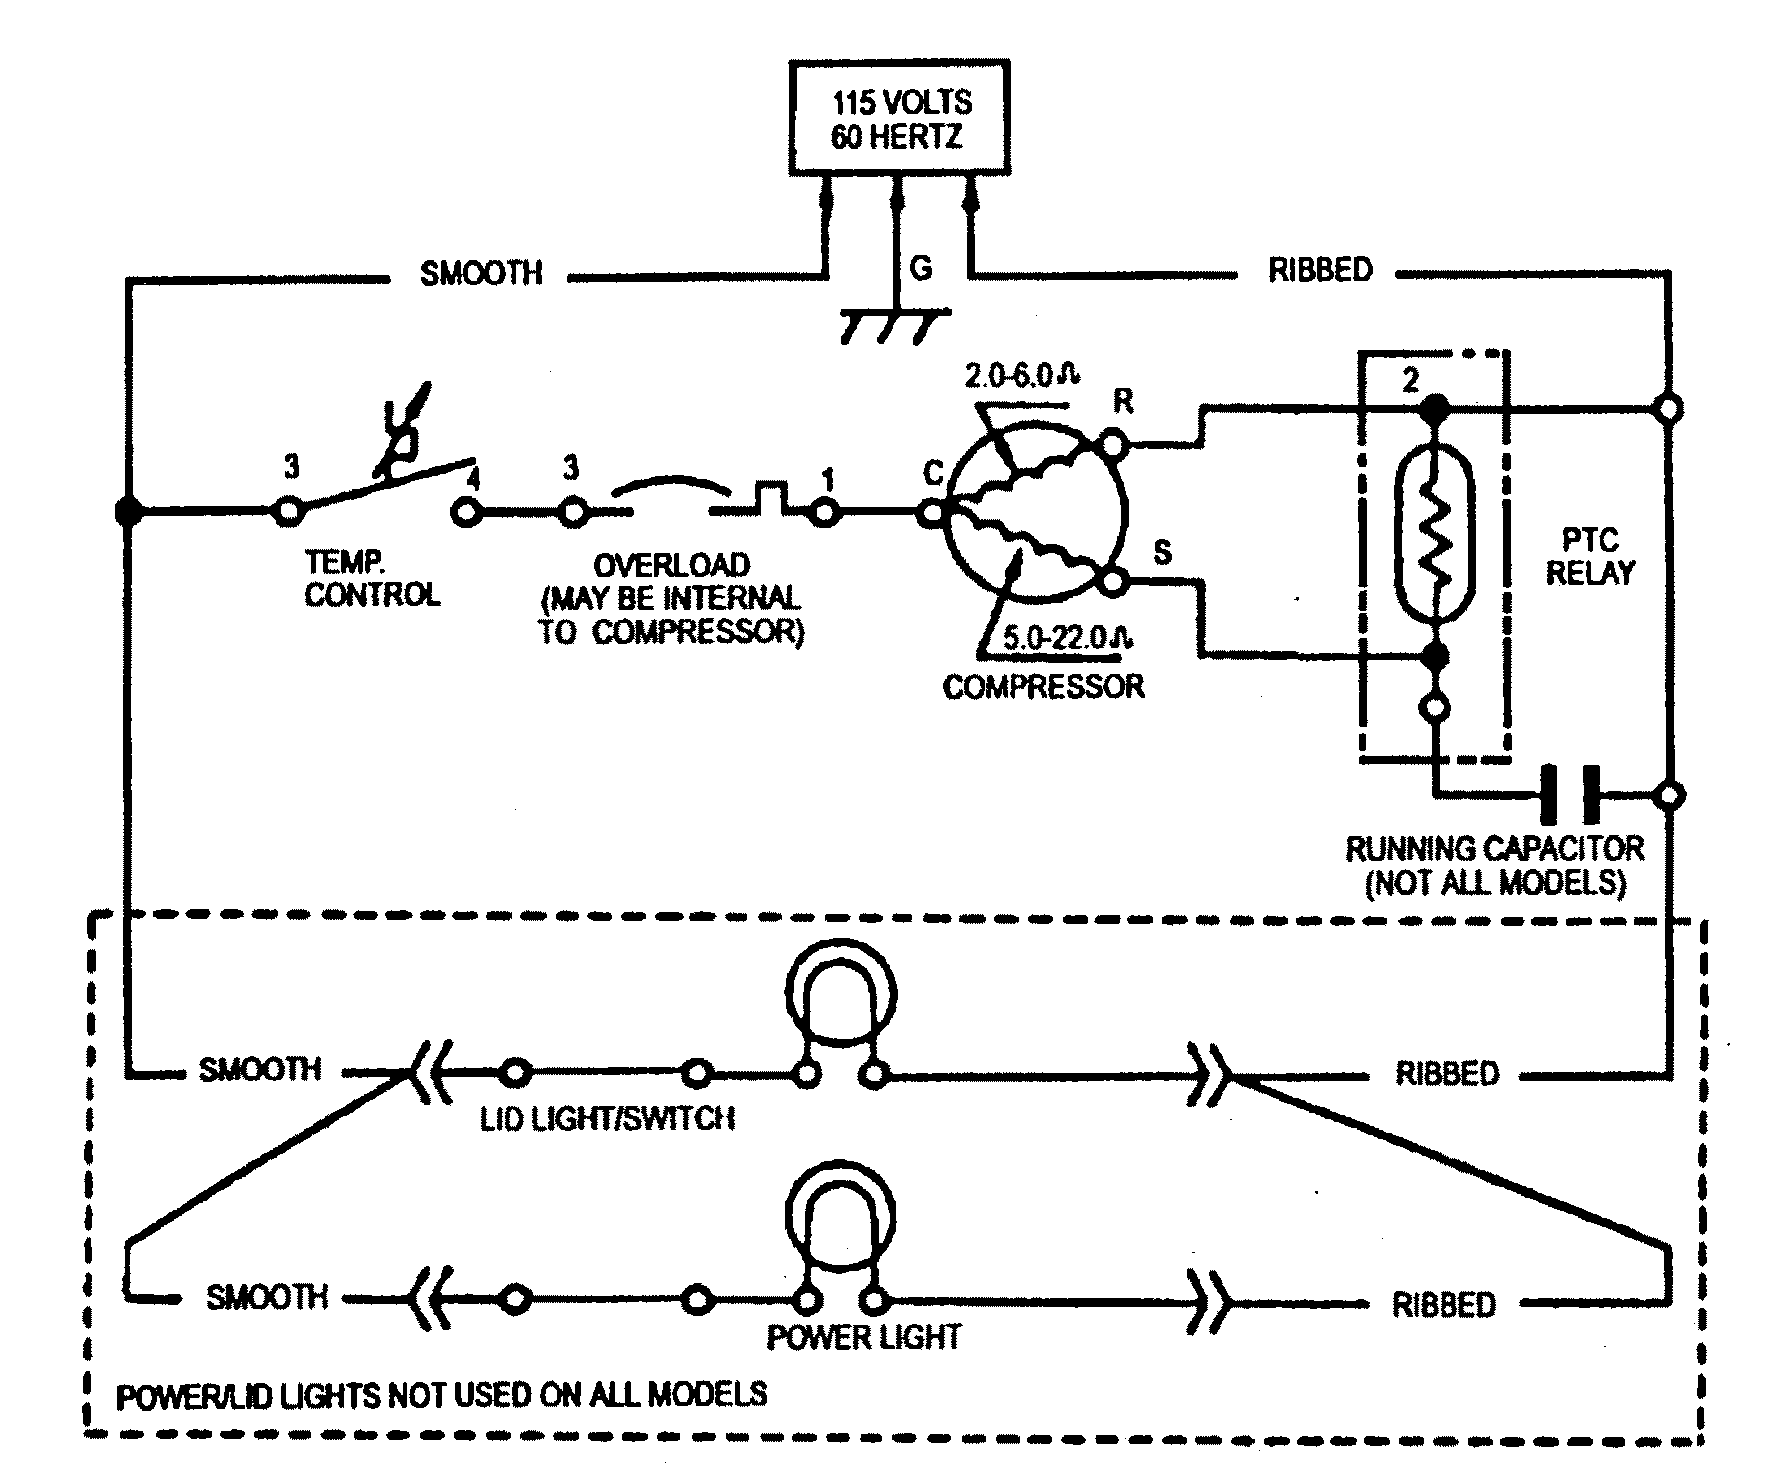 frigidaire valve wiring diagram tf 4415  refrigerator capacitor wiring diagram free diagram  refrigerator capacitor wiring diagram